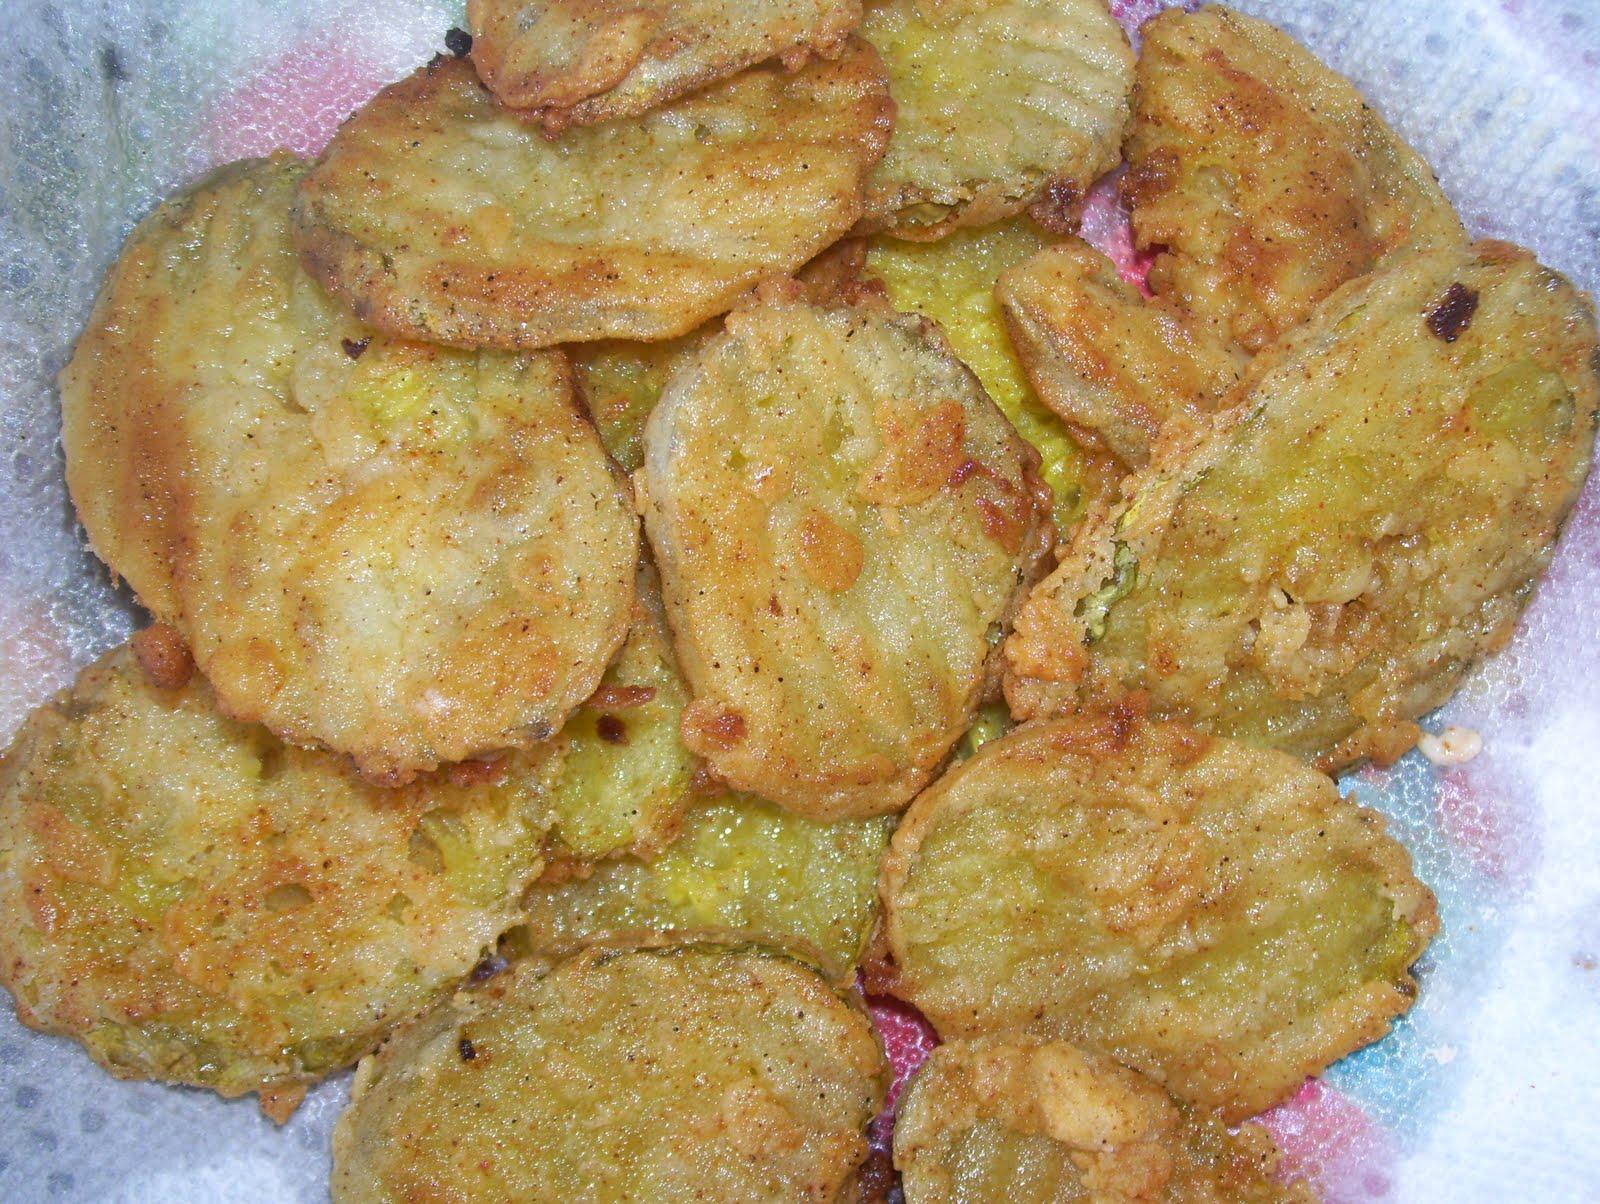 Pretend Chef: Fried Pickles